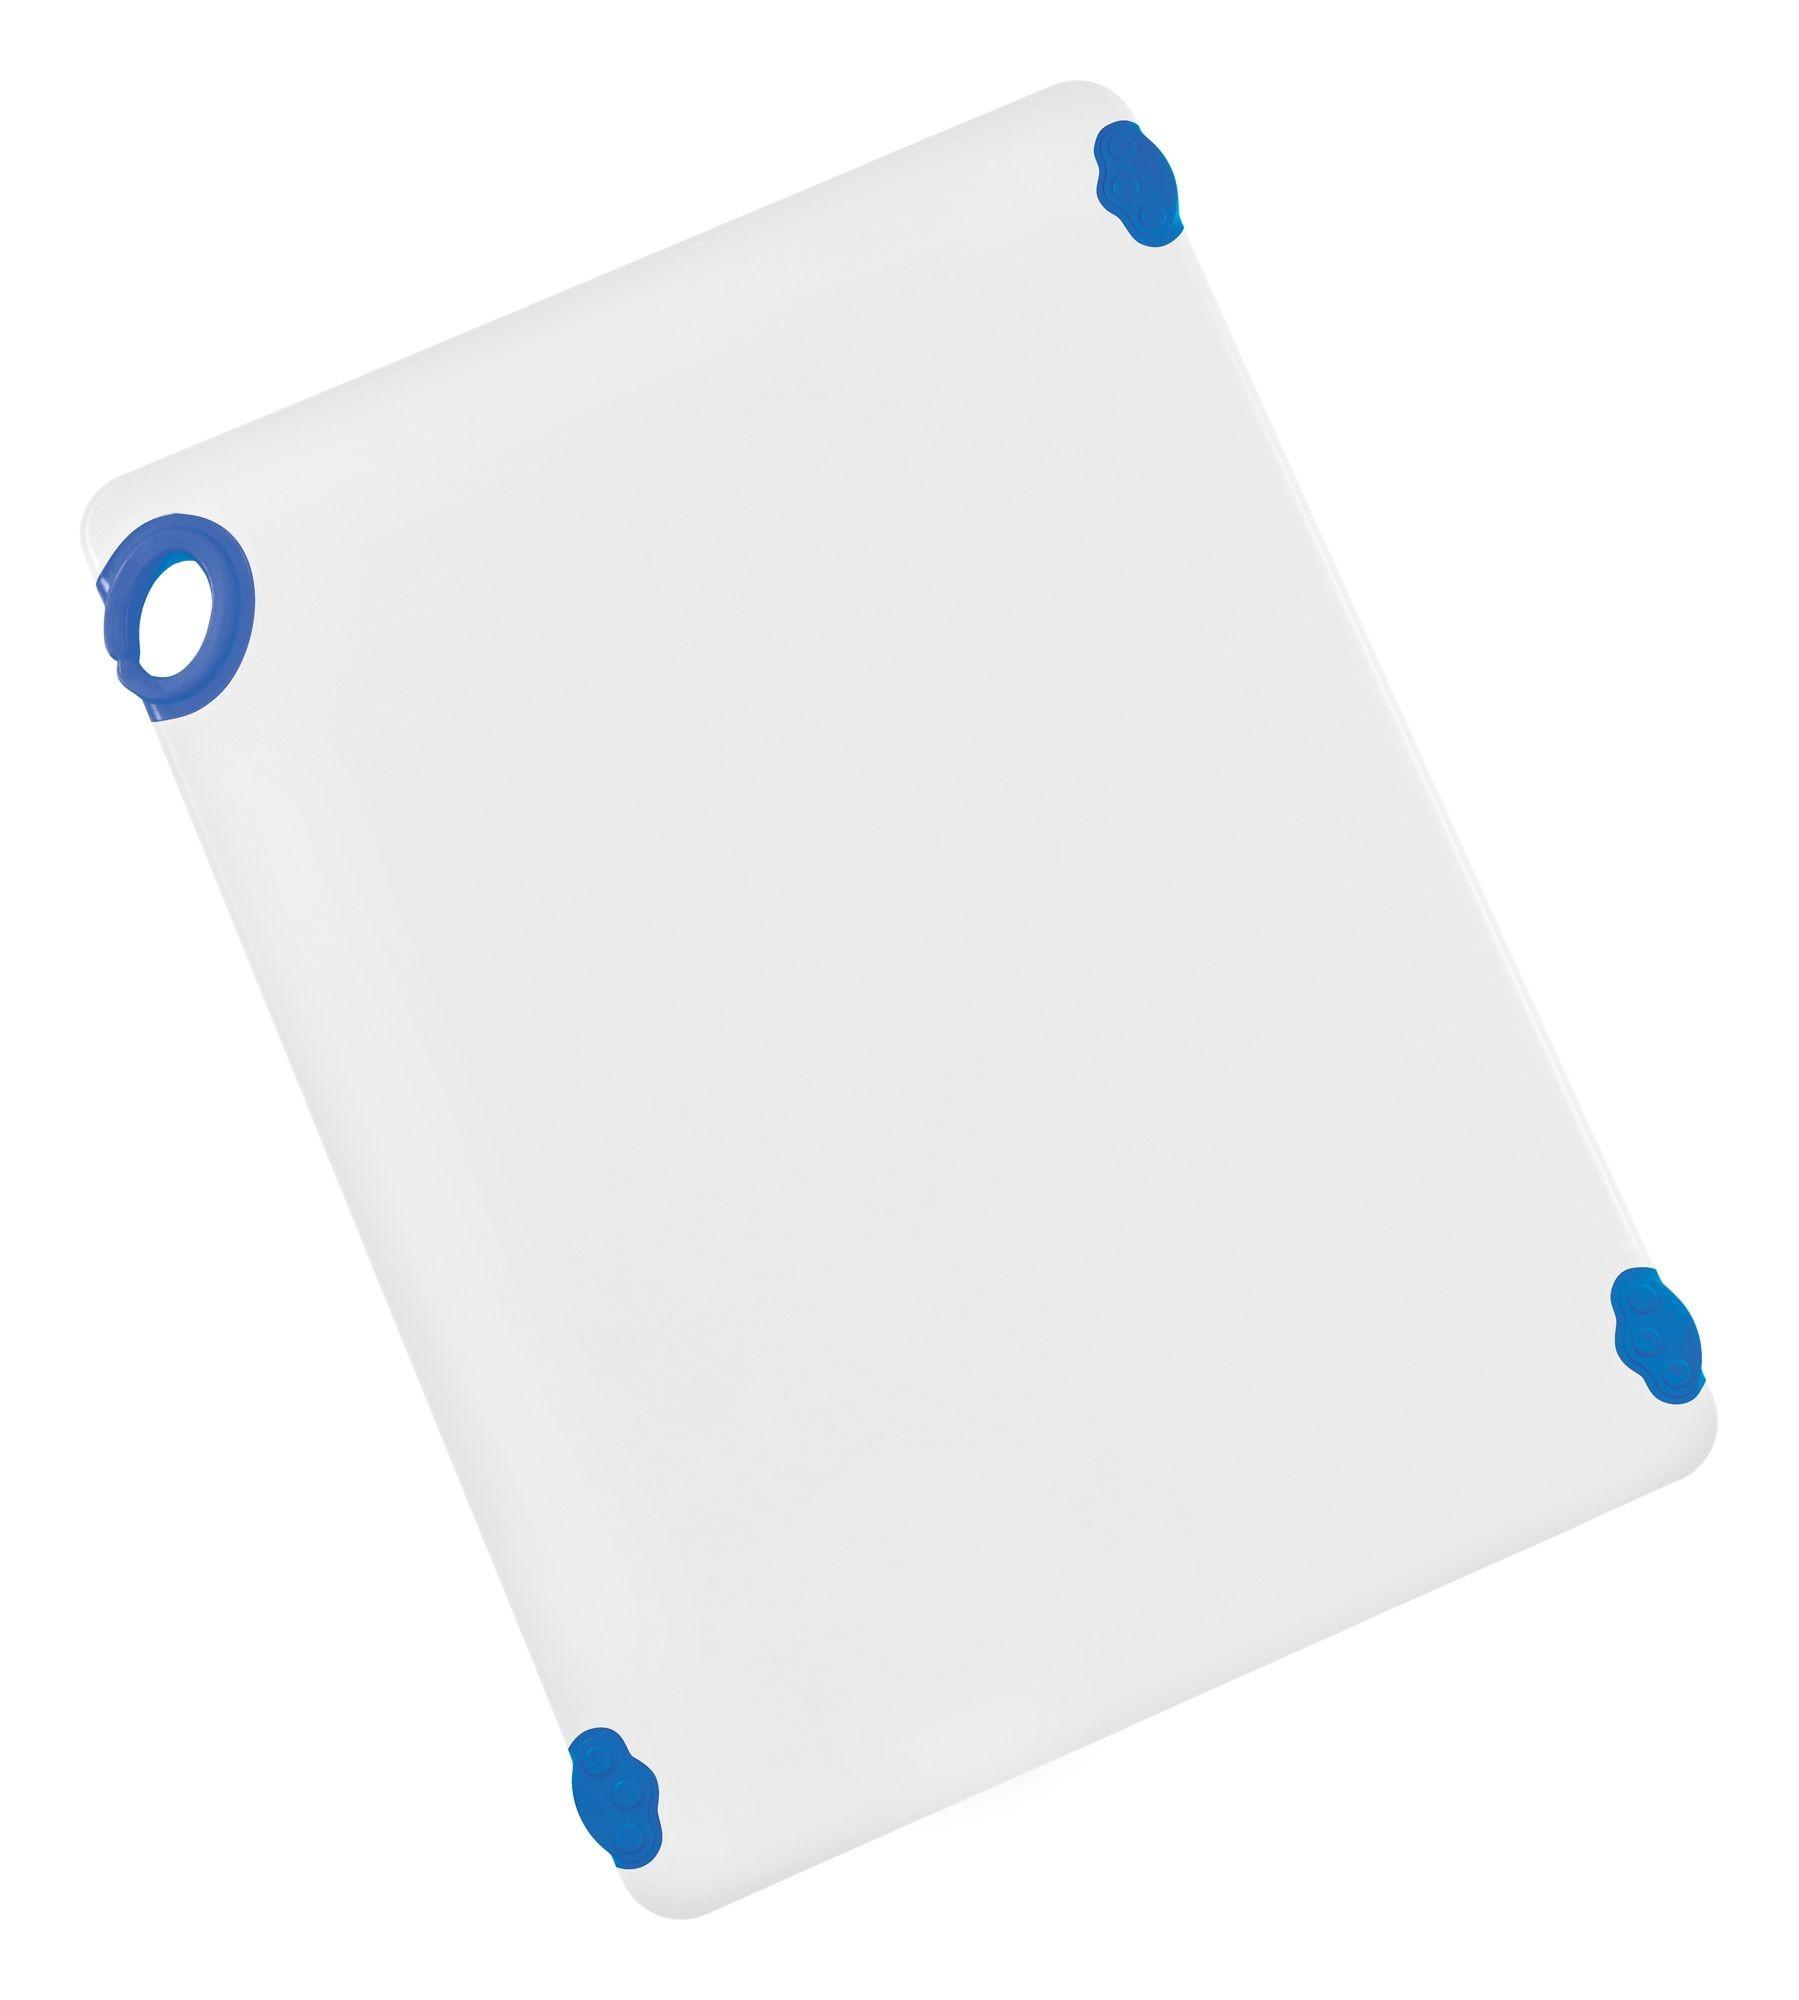 "Winco CBN-1824BU Blue StatikBoard Cutting Board with Hook, 18"" x 24"" x 1/2"""